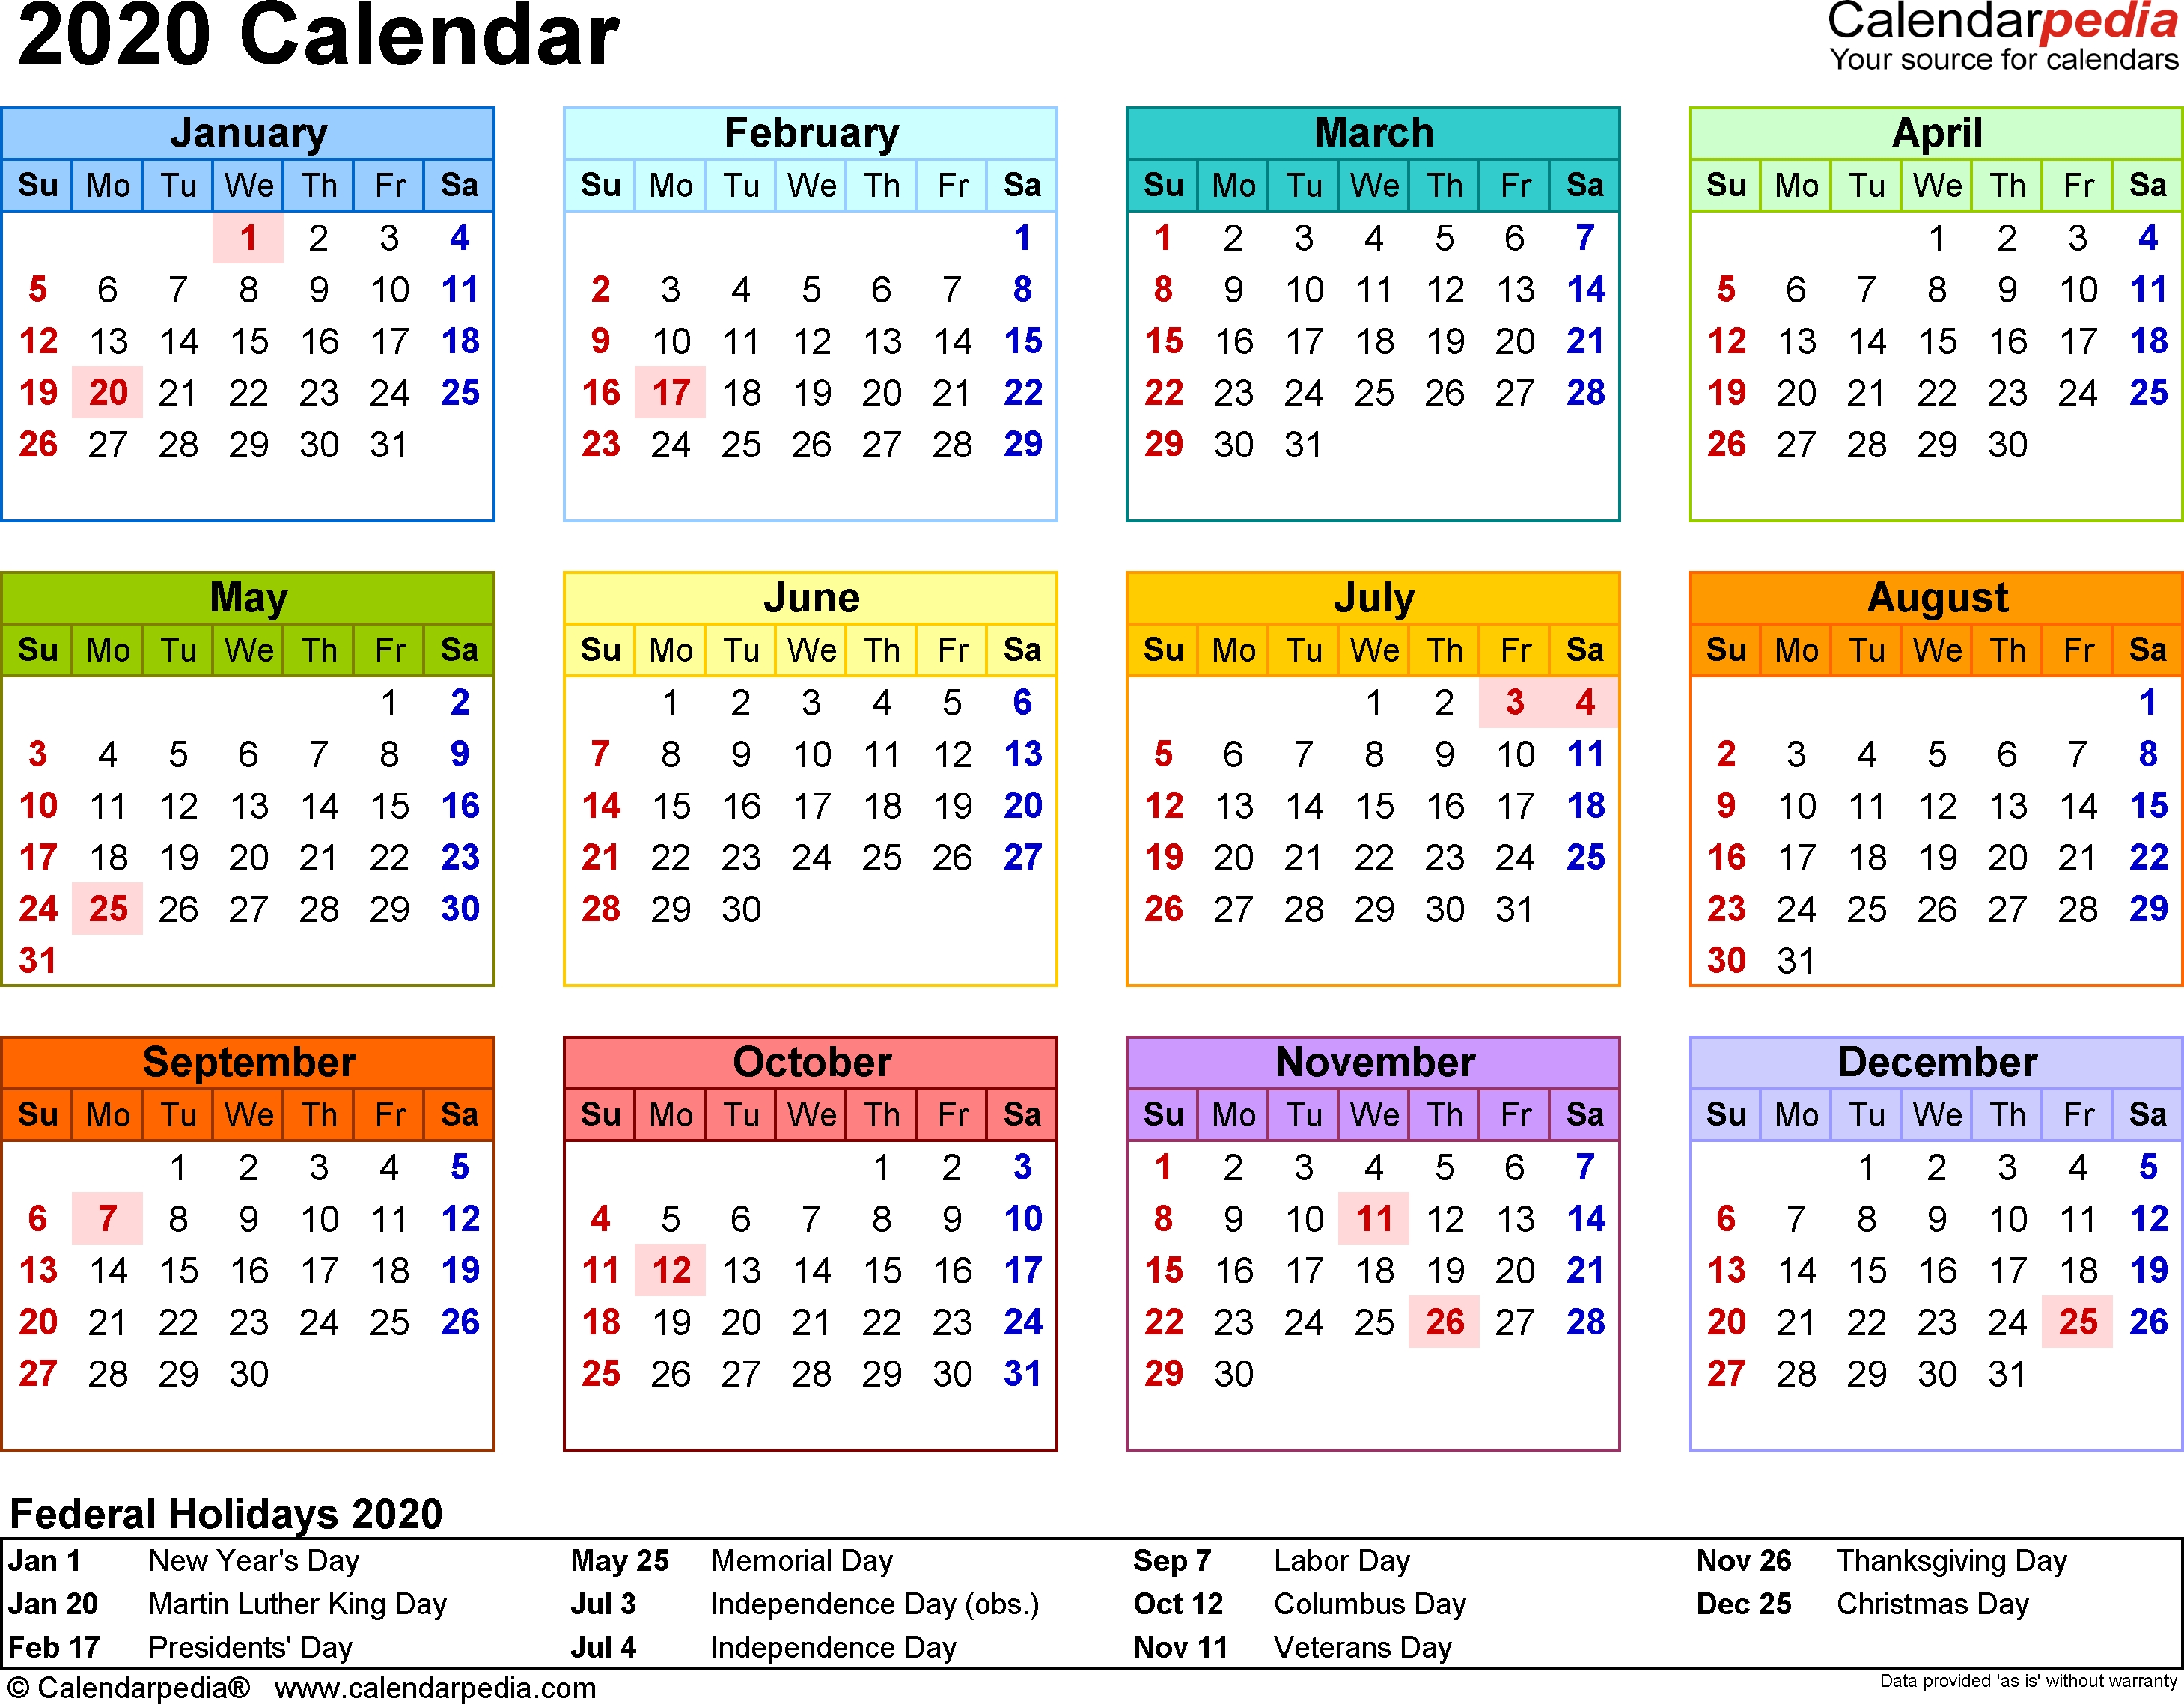 2020 Calendar - 18 Free Printable Word Calendar Templates-2020 Printable Employee Attendance Calendar Template